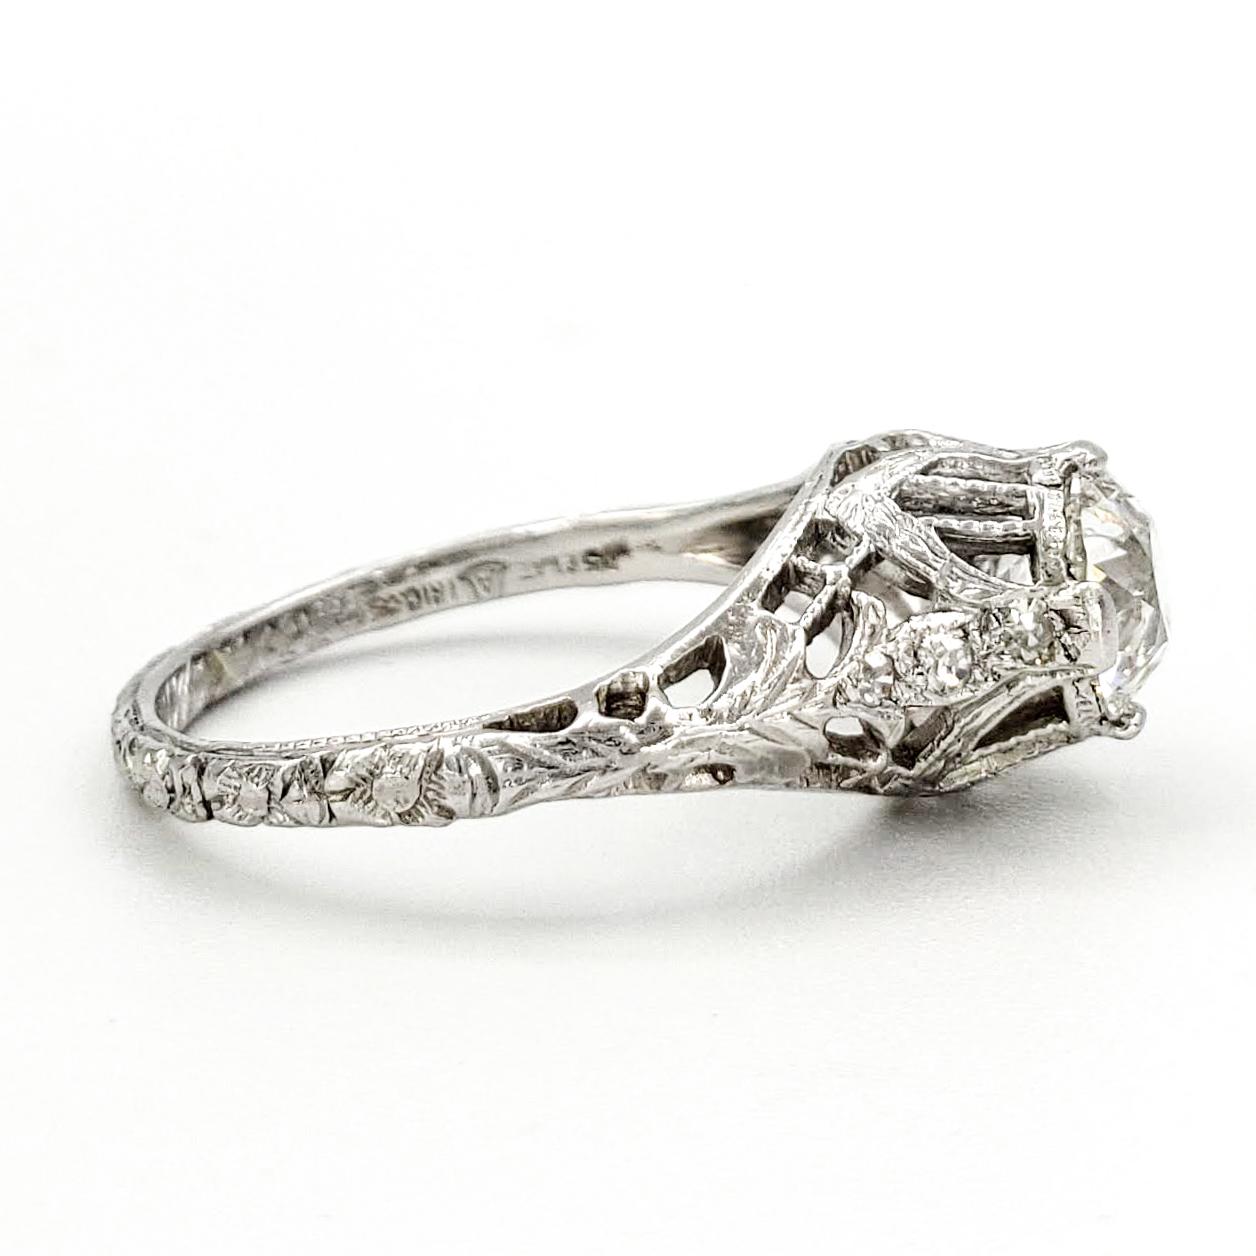 vintage-platinum-engagement-ring-with-0-71-carat-old-european-cut-diamond-egl-f-vs2